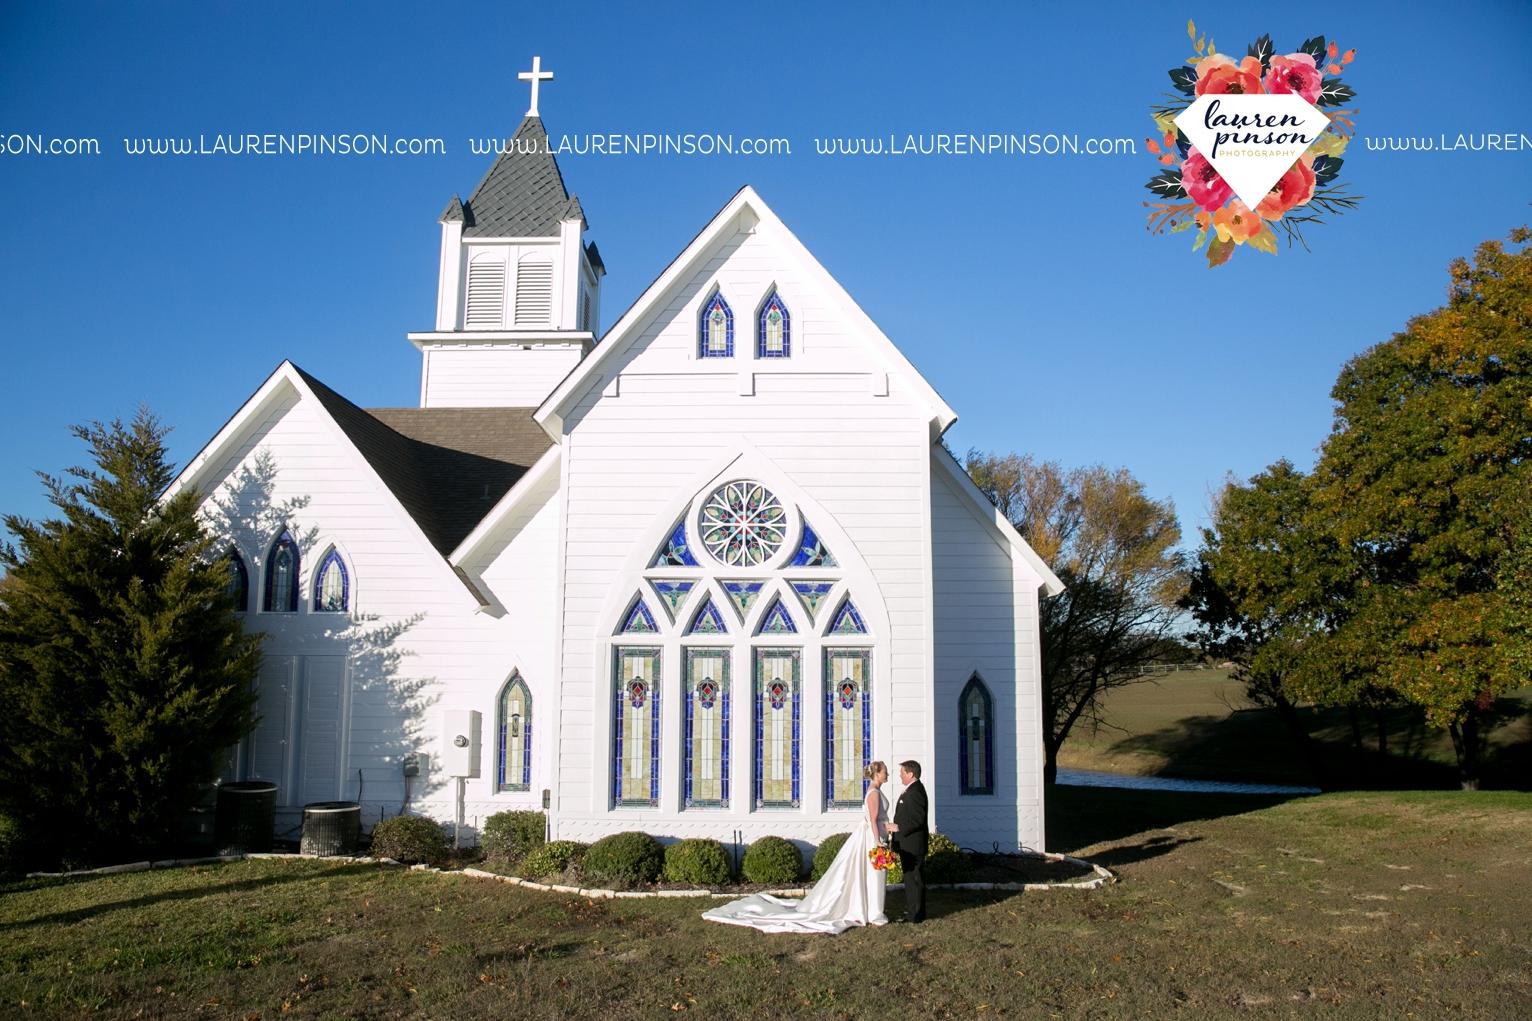 bells-texas-wedding-photography-at-willowood-ranch-chapel-north-texas-wichita-falls-wedding-photographer_1831.jpg